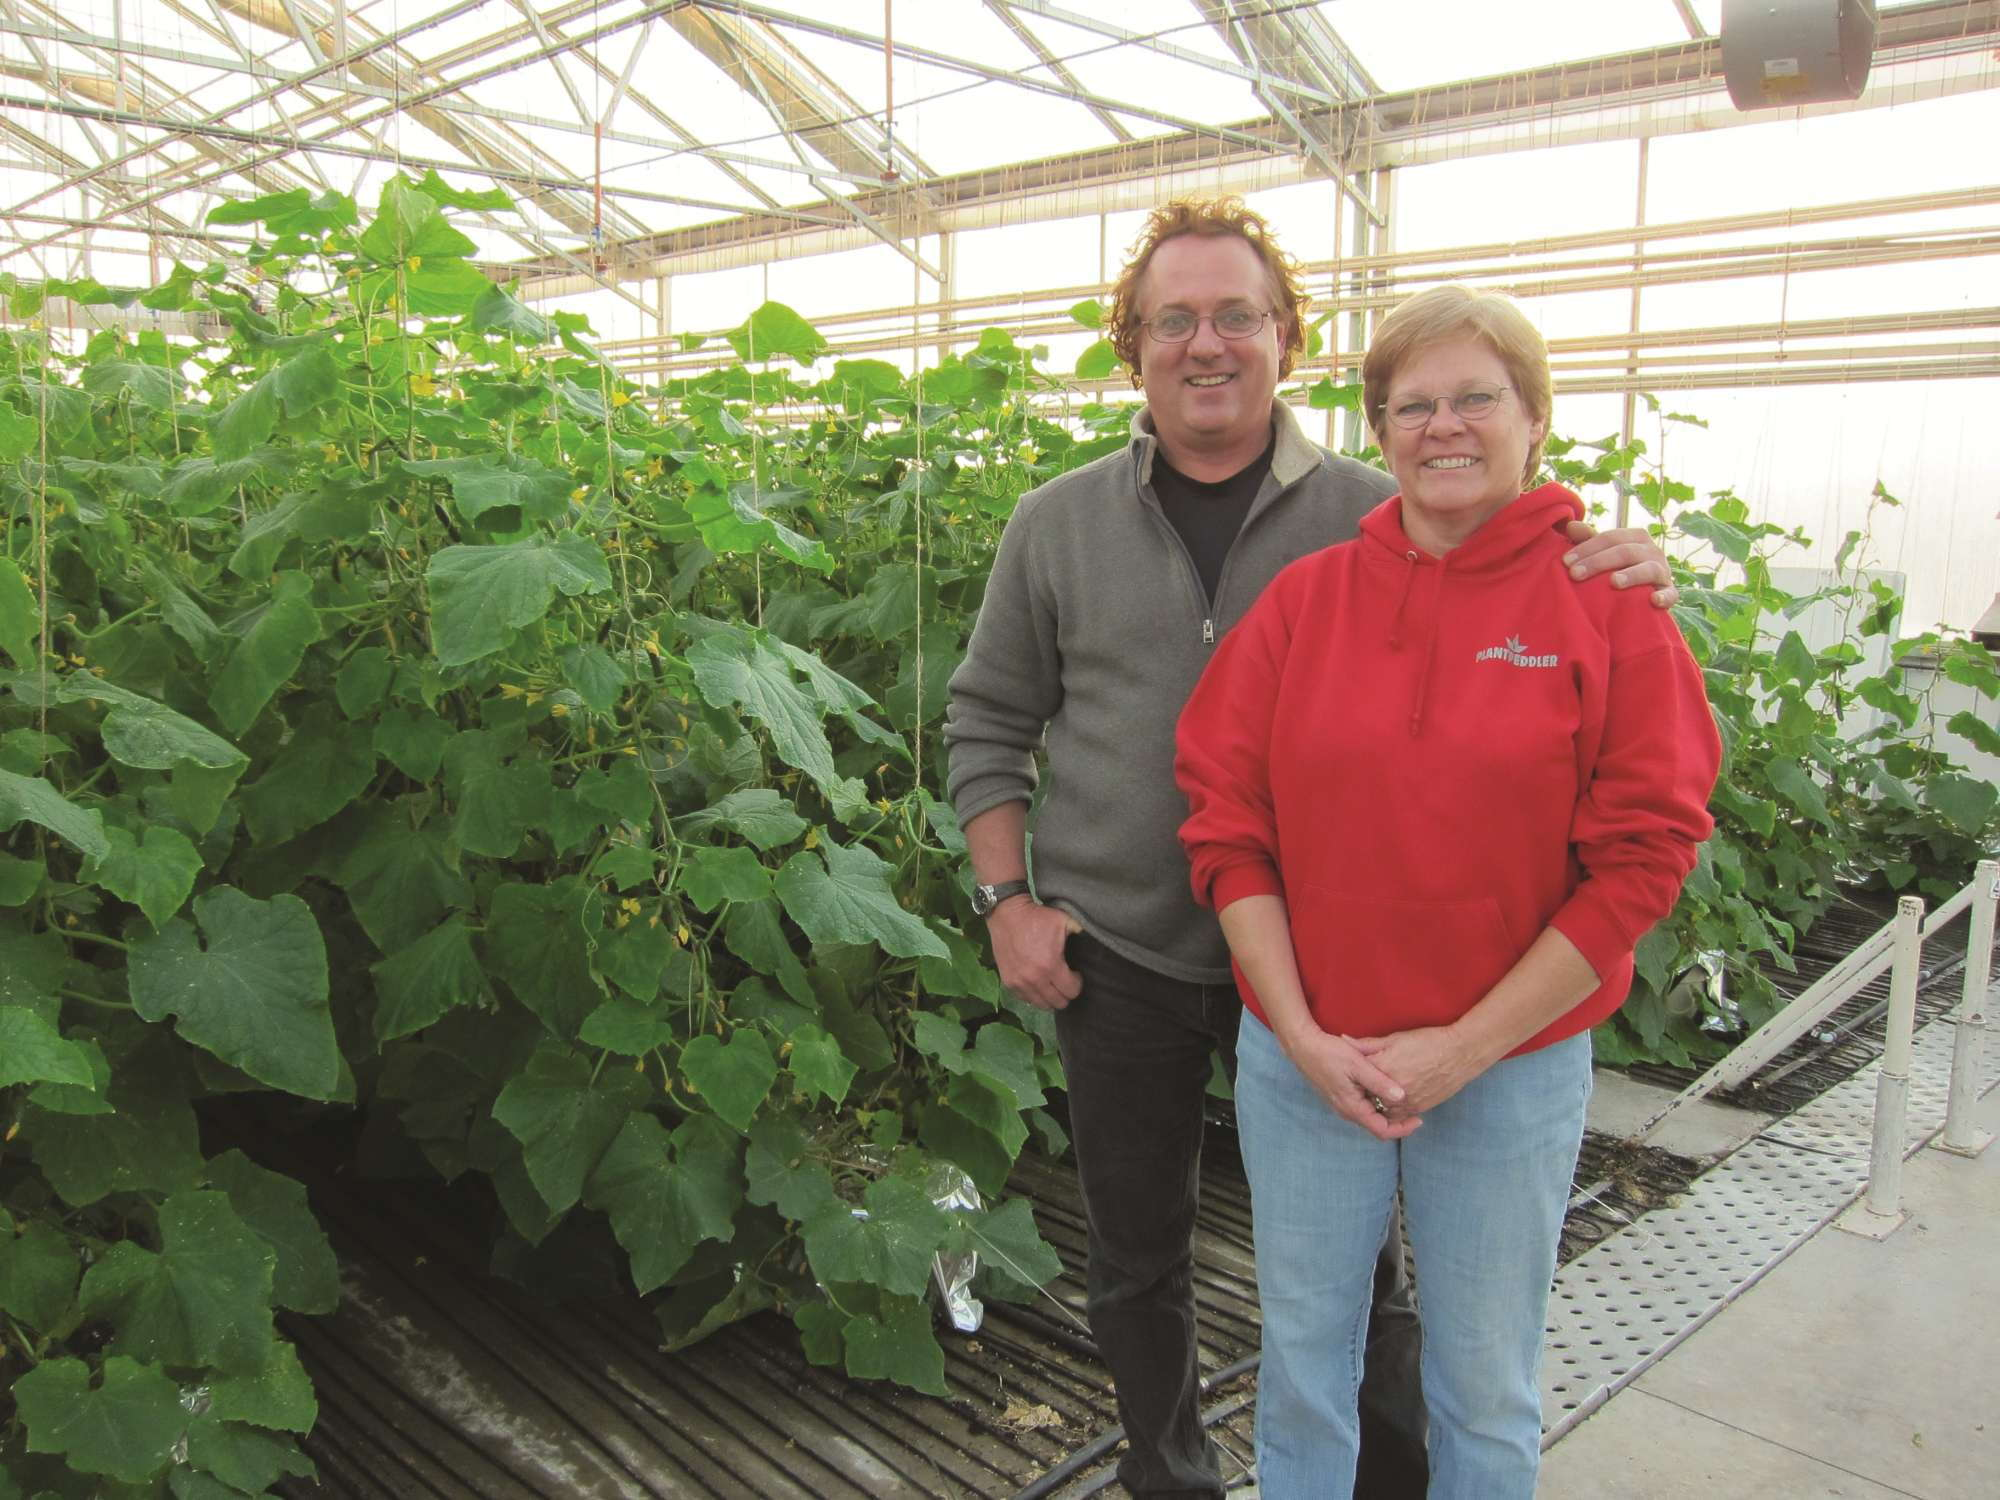 Plantpeddler Succeeds With Produce